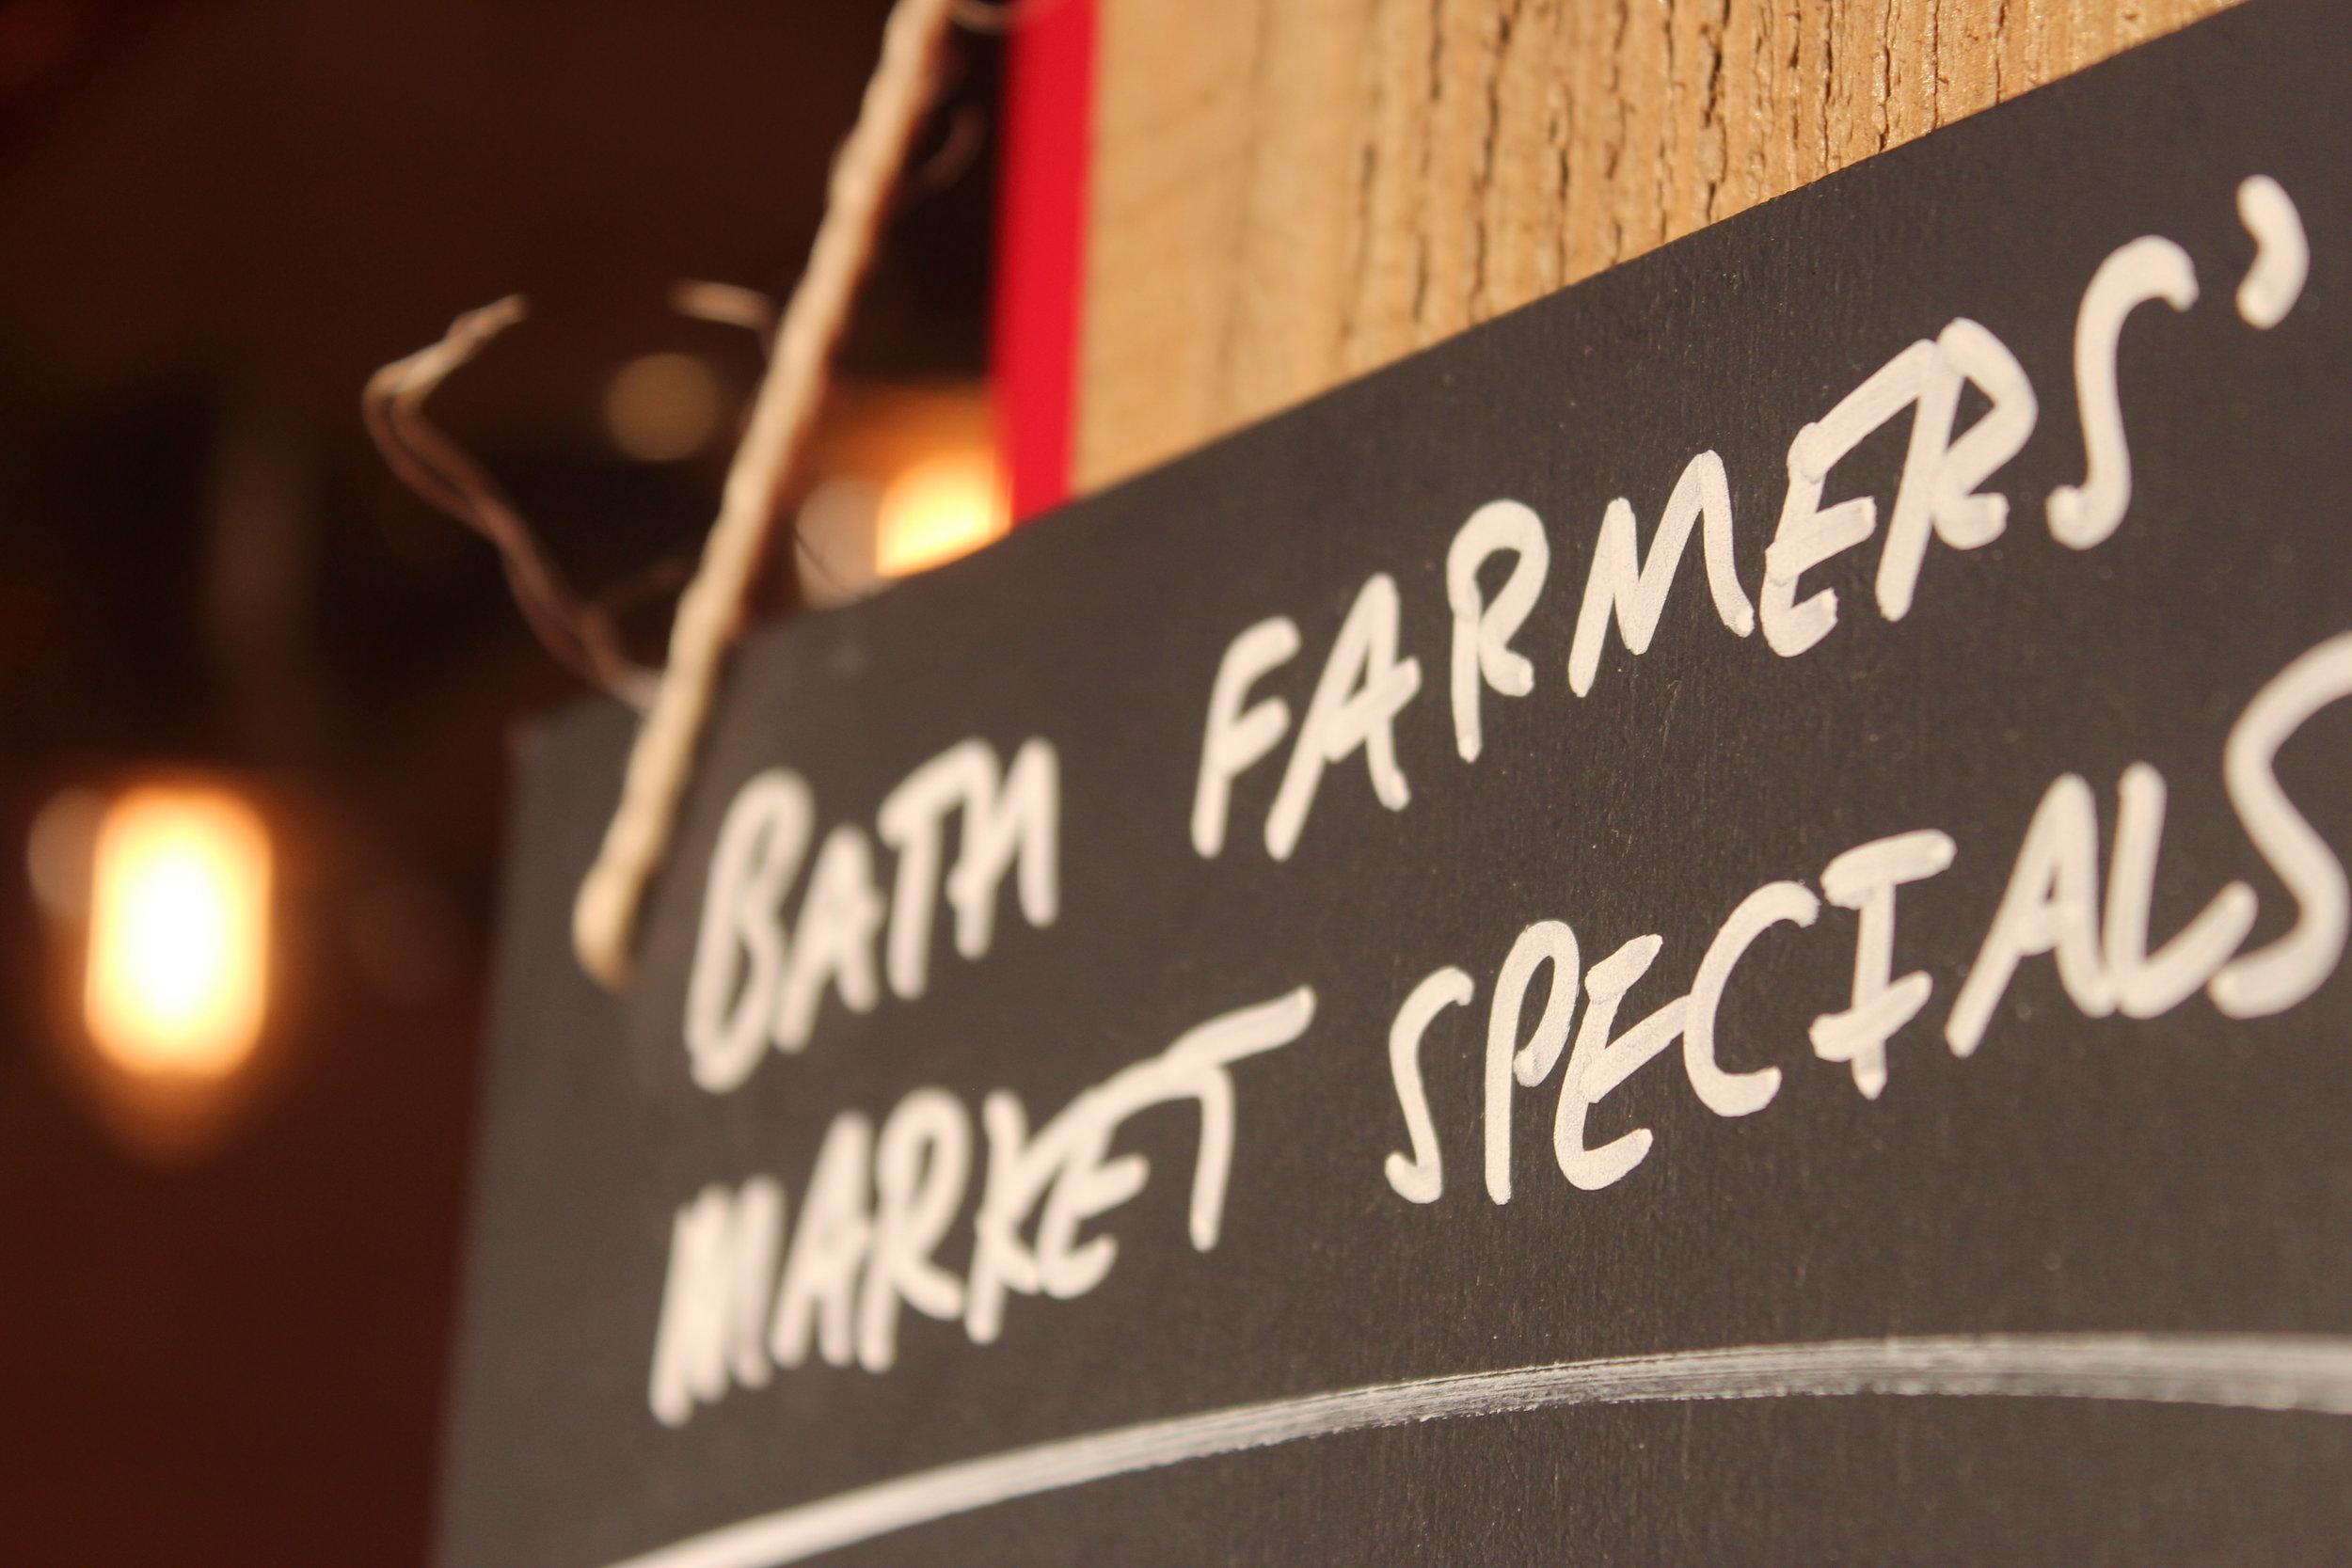 bath-farmers-markets-bath-pizza-co